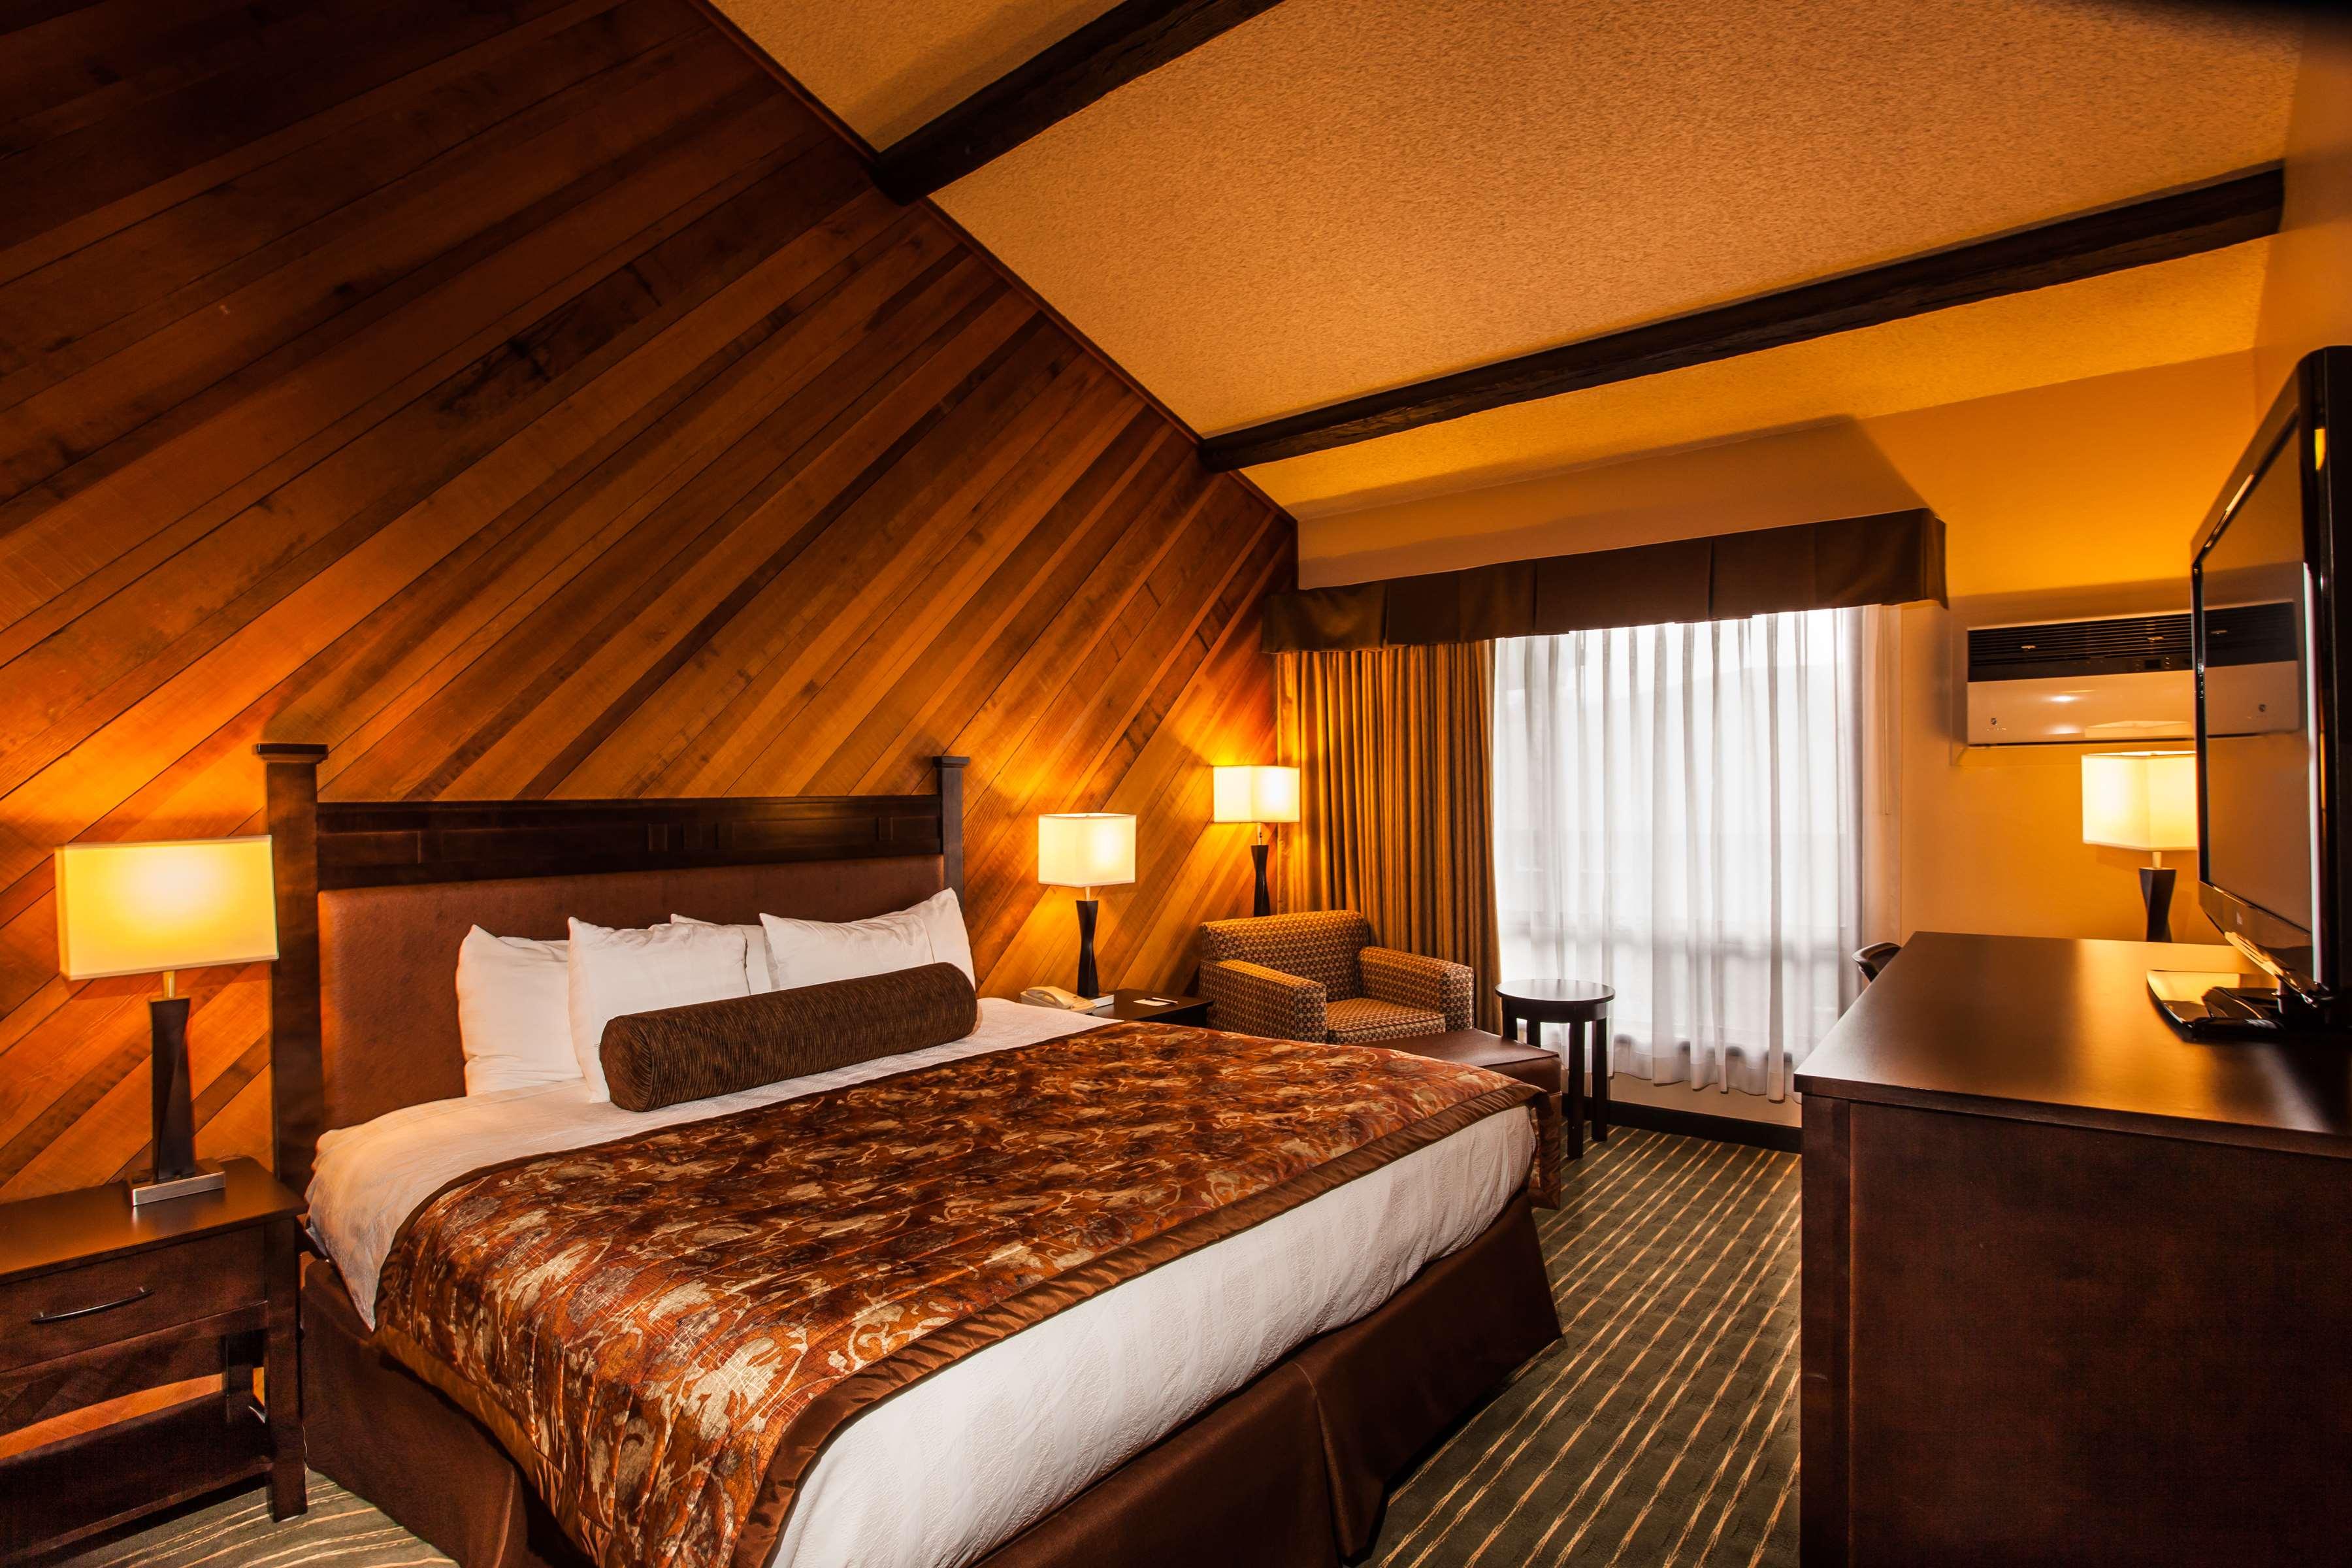 Mount Shasta Inn Bed And Breakfast